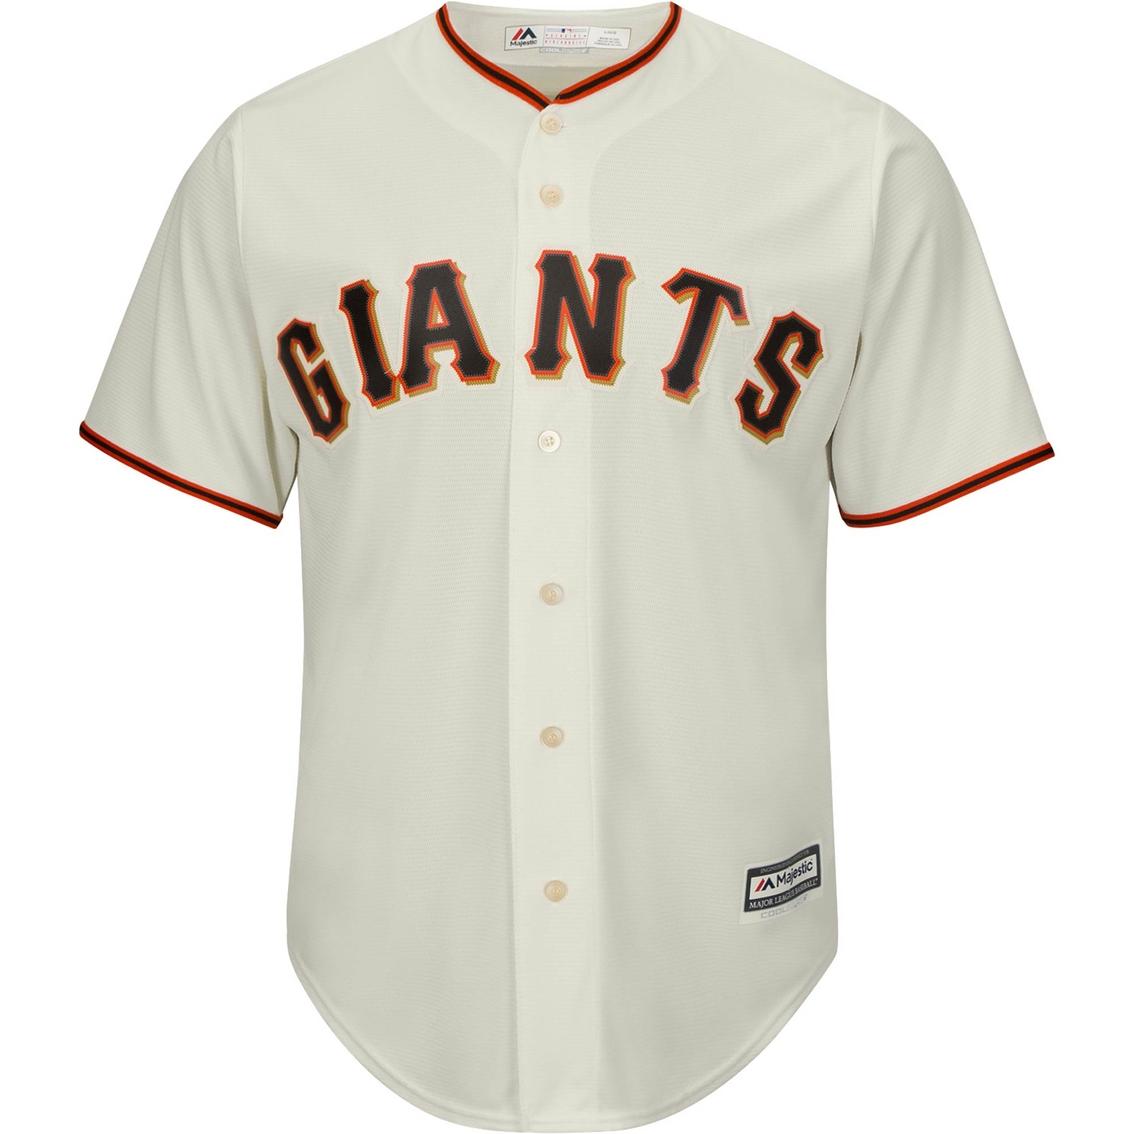 794c16d5 Majestic Mlb San Francisco Giants Replica Home Jersey | Shirts ...